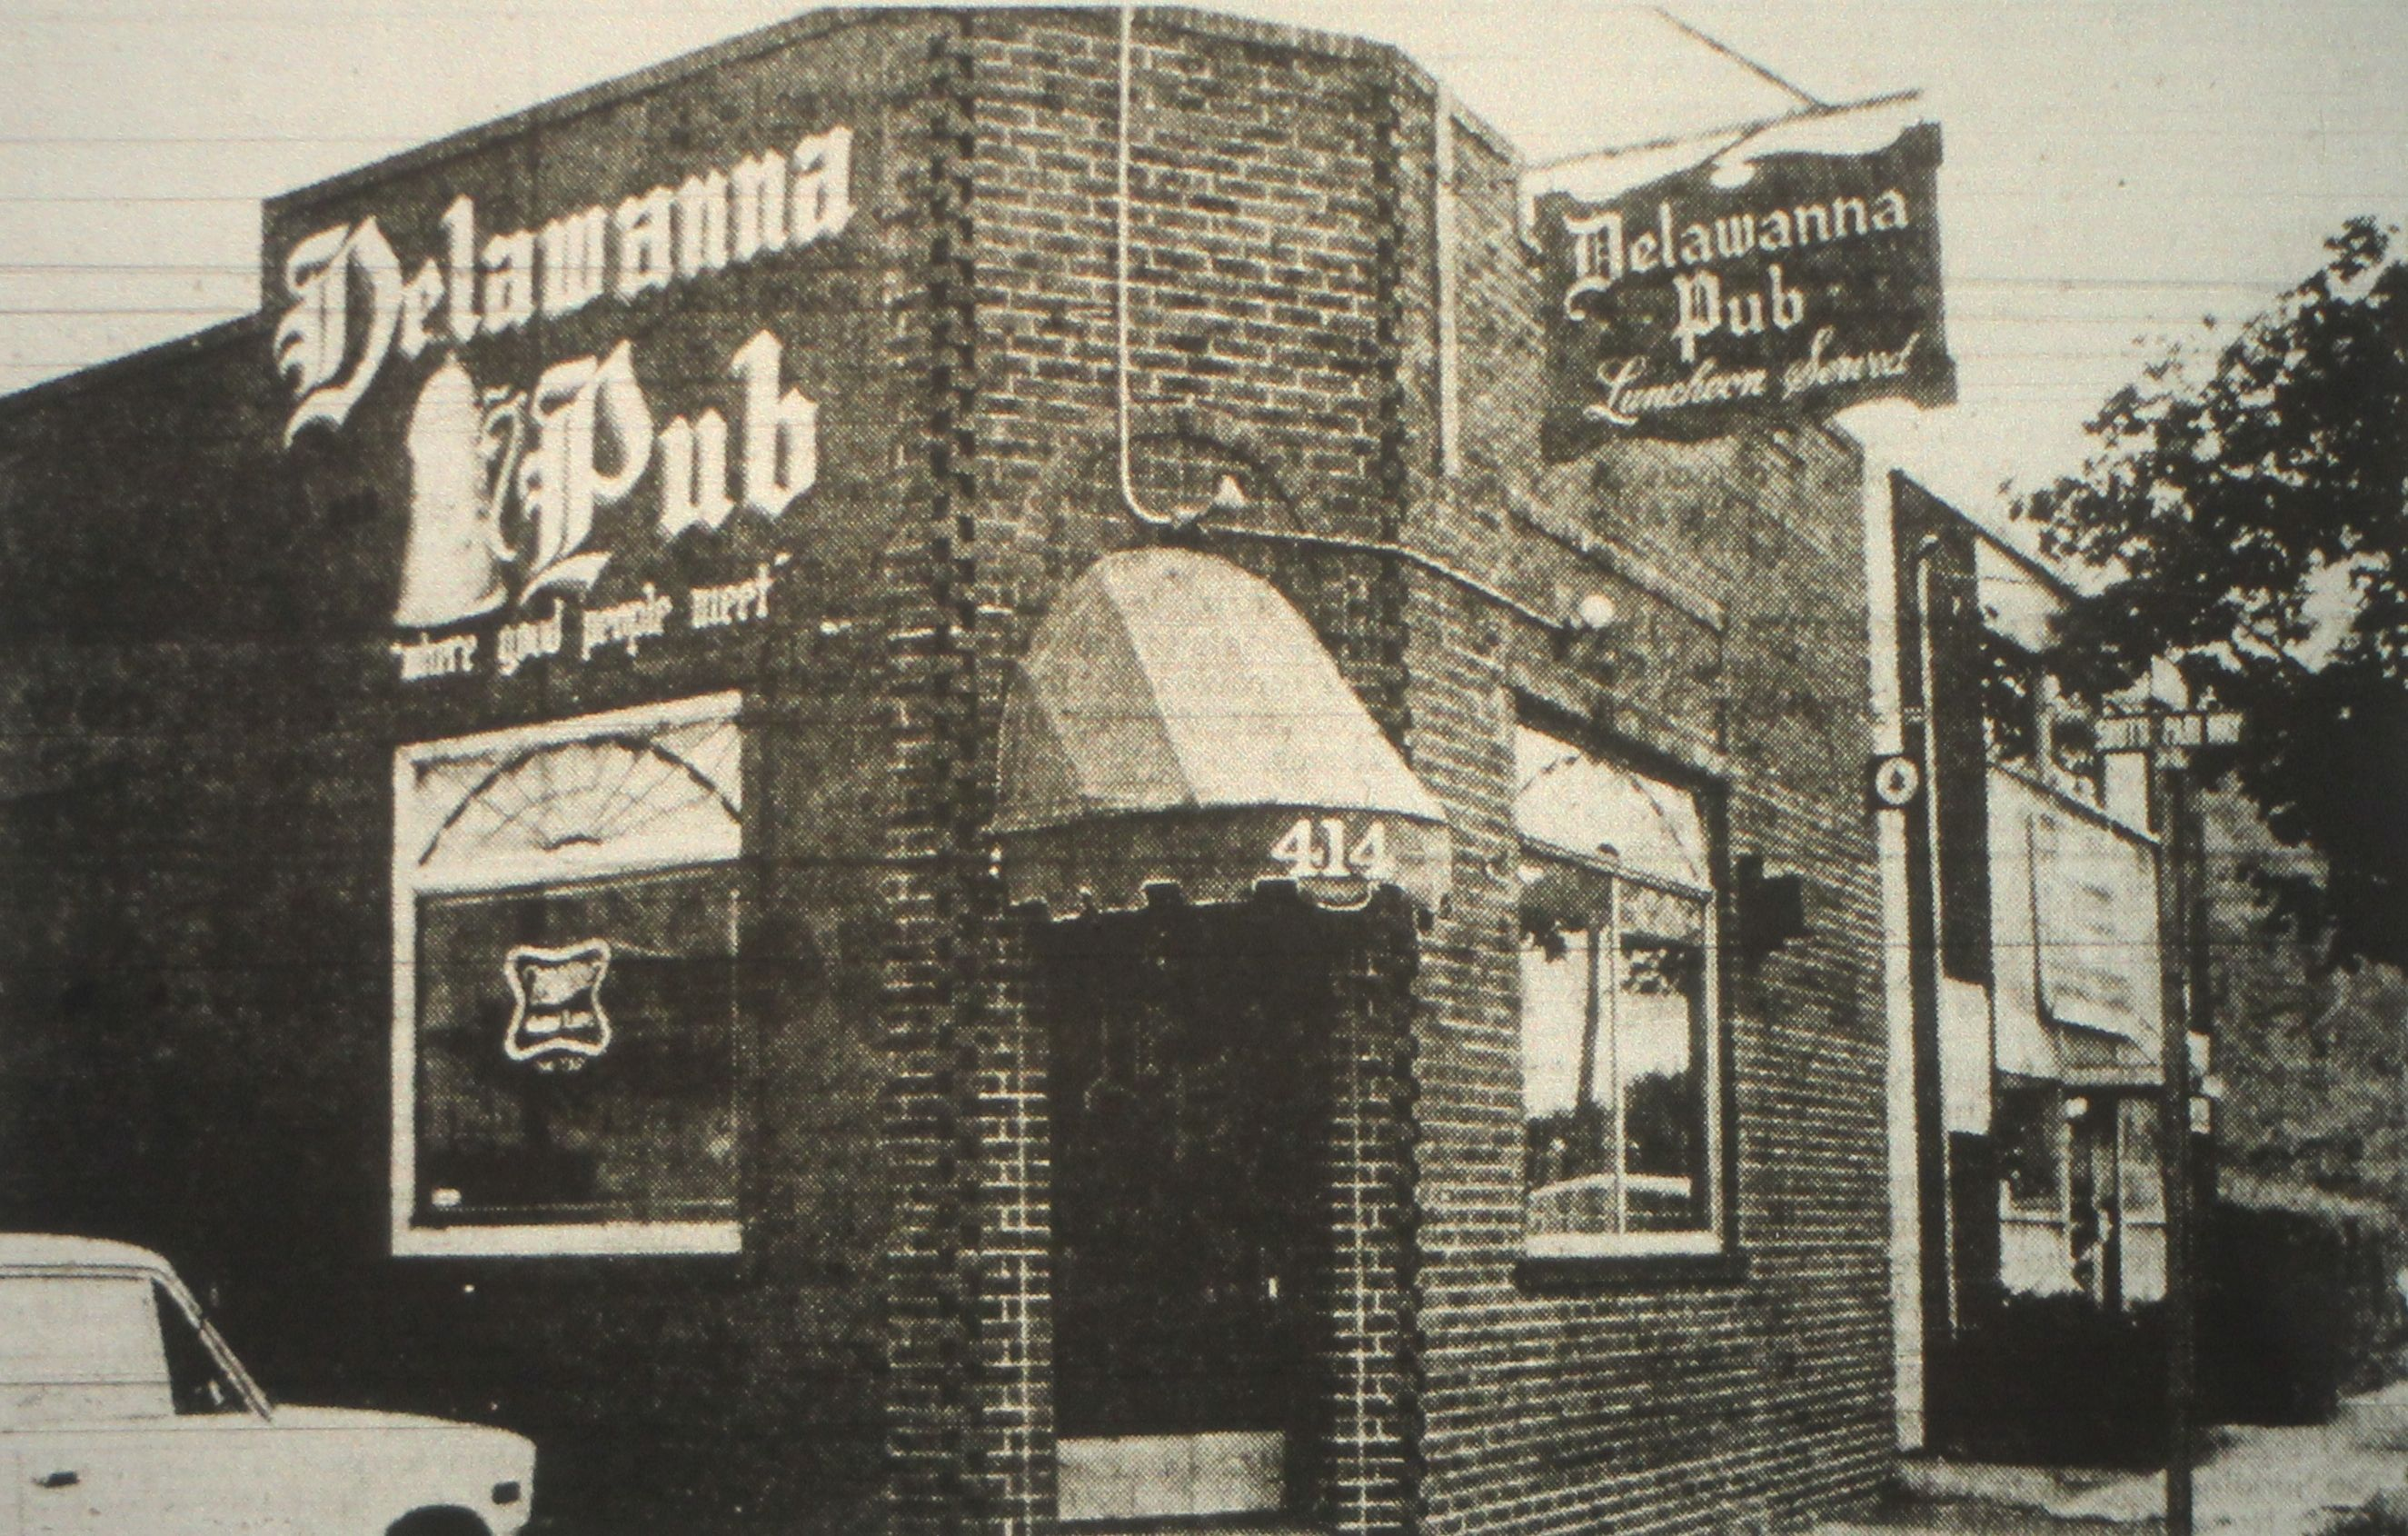 Delawanna Pub Clifton Nj 1978 In 2019 Garden State Plaza